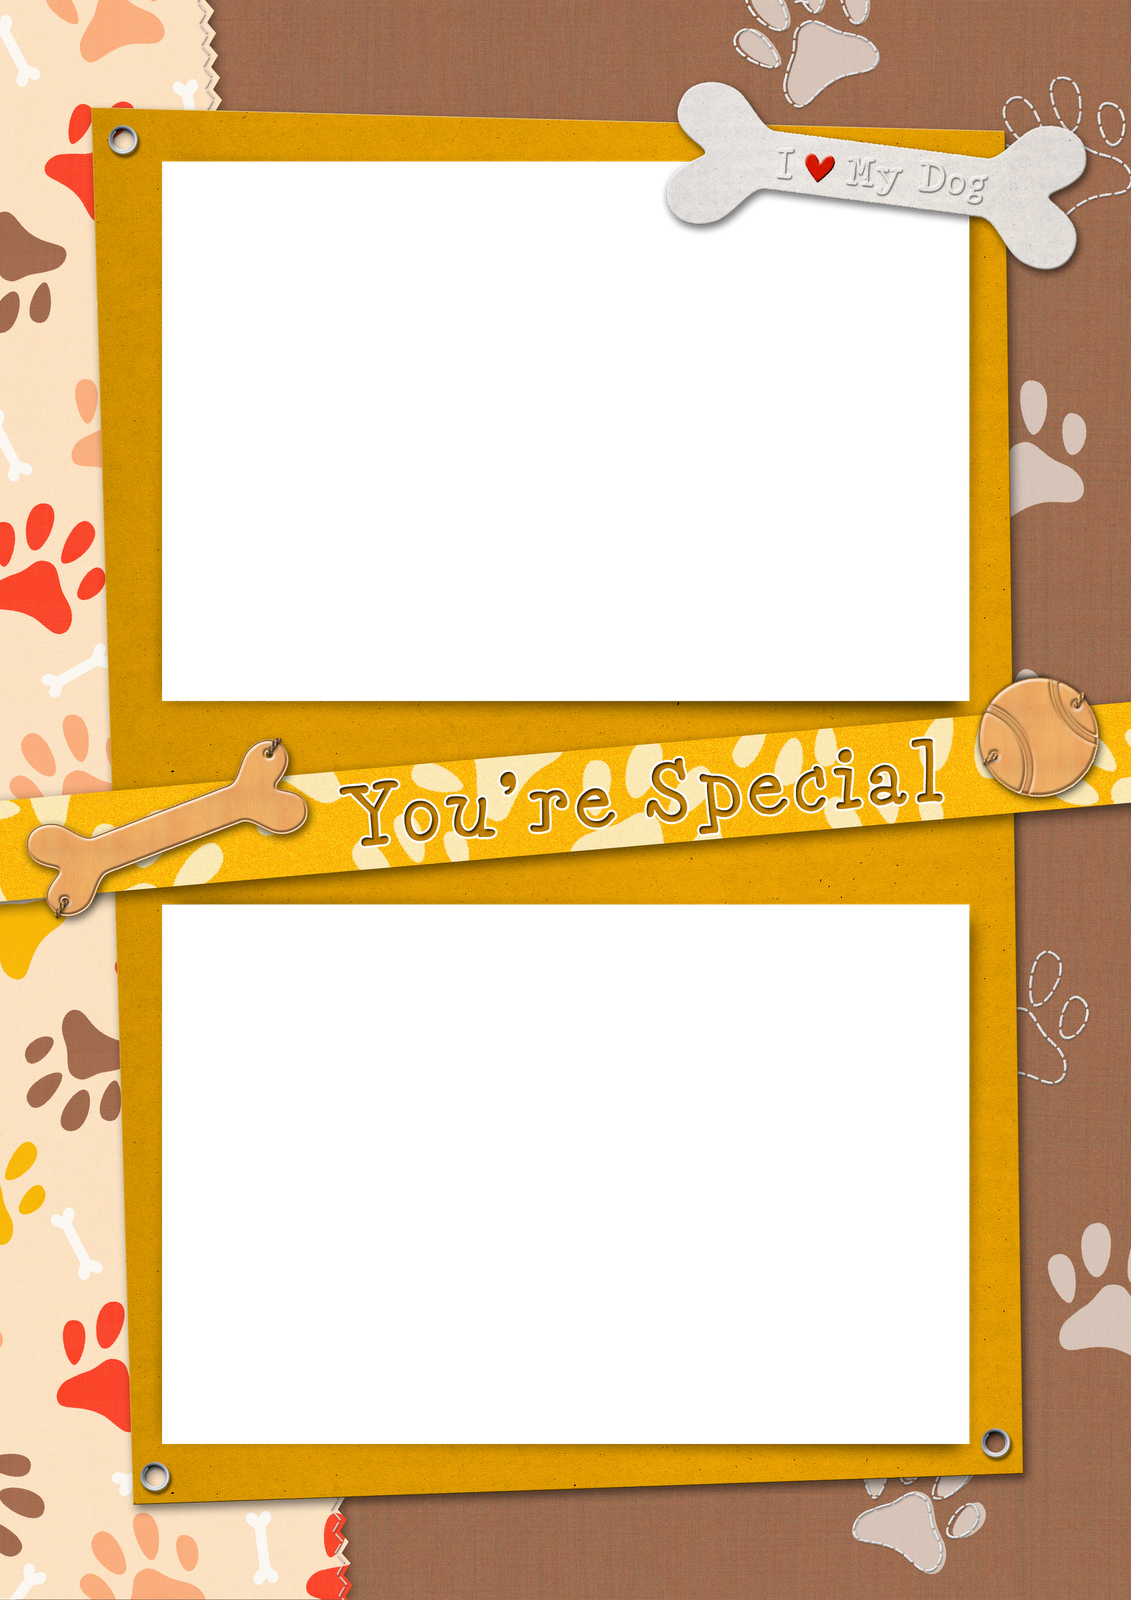 Frames clipart dog. Pin by hoken kenkyo